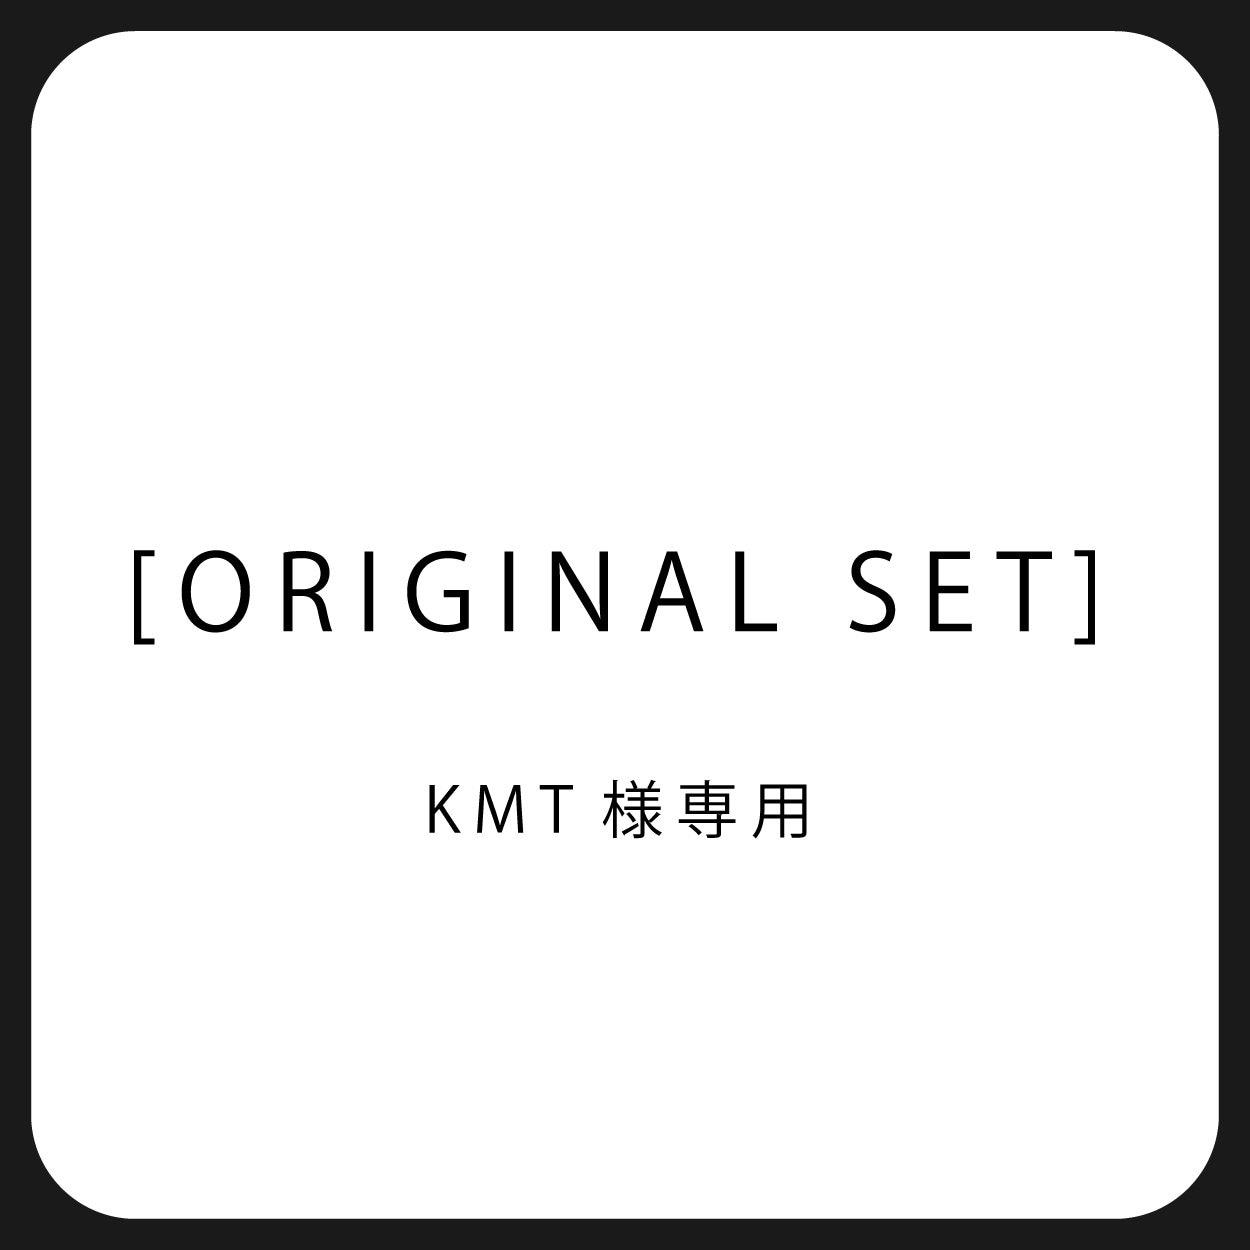 [ORIGINAL SET]KMT様専用のイメージその1